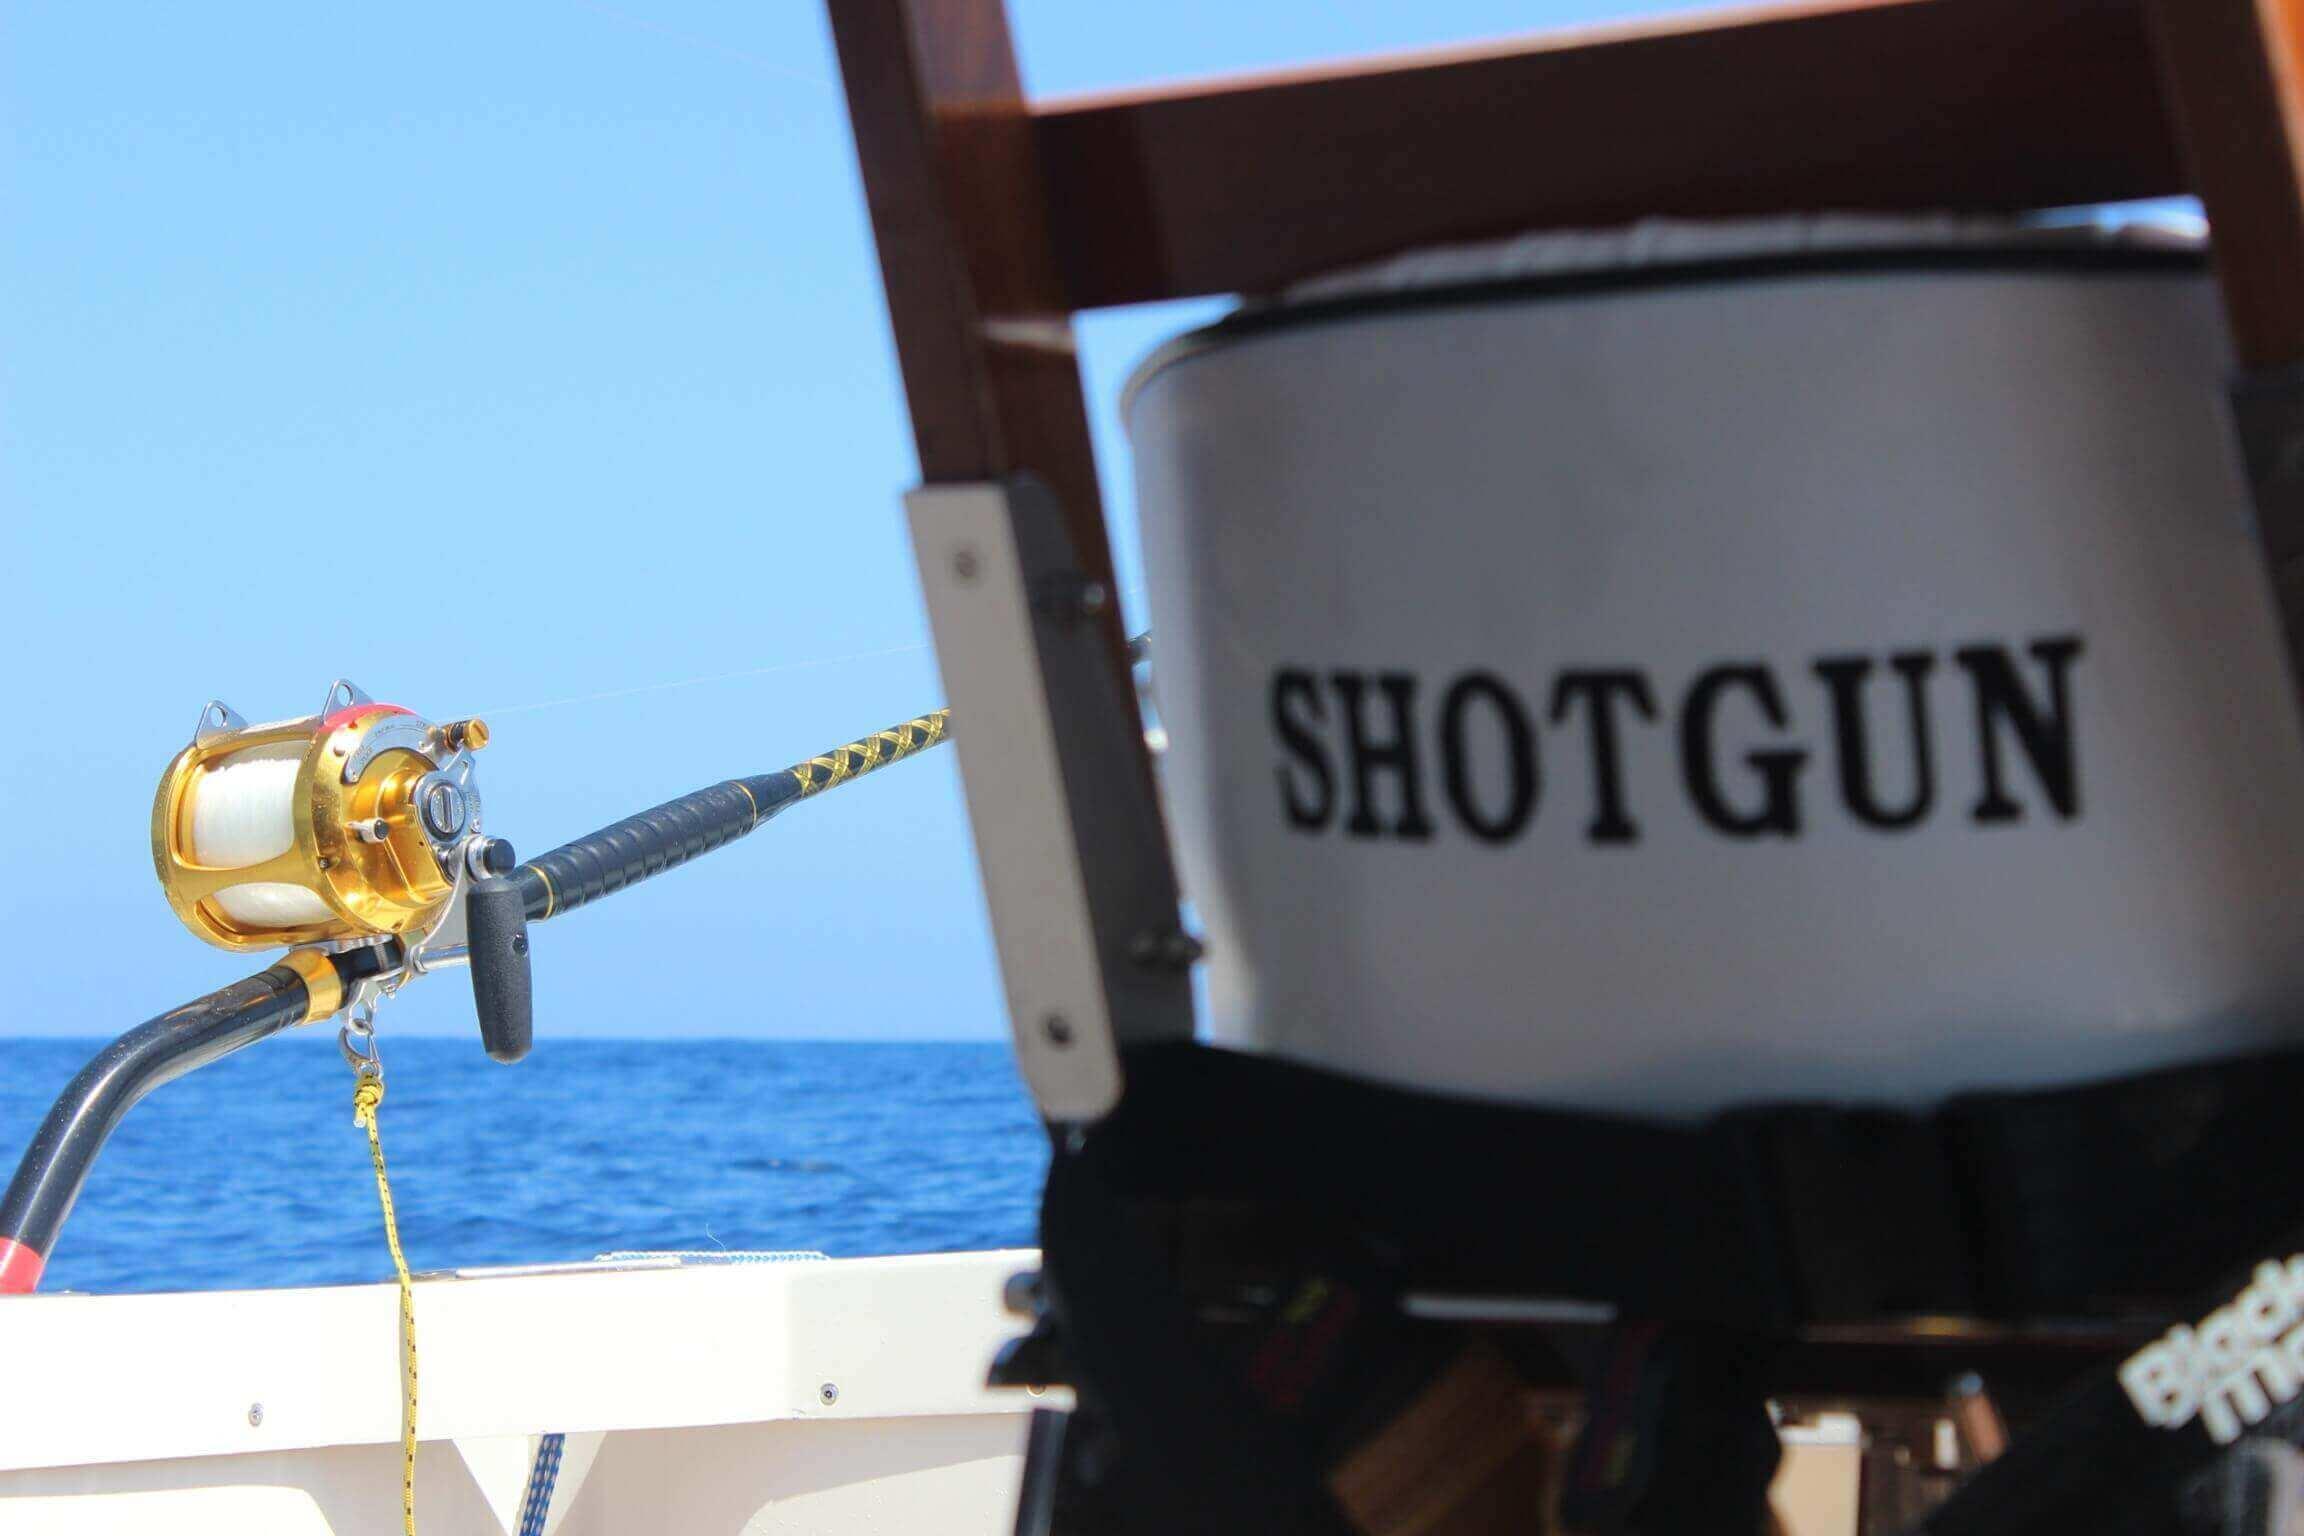 shotgun-marine-electronics-gps-fishfinder-autopilot-chartplotter-01b820ad419a69102bee50483d37190aaeccdcc0a0-1-1-1-.jpg